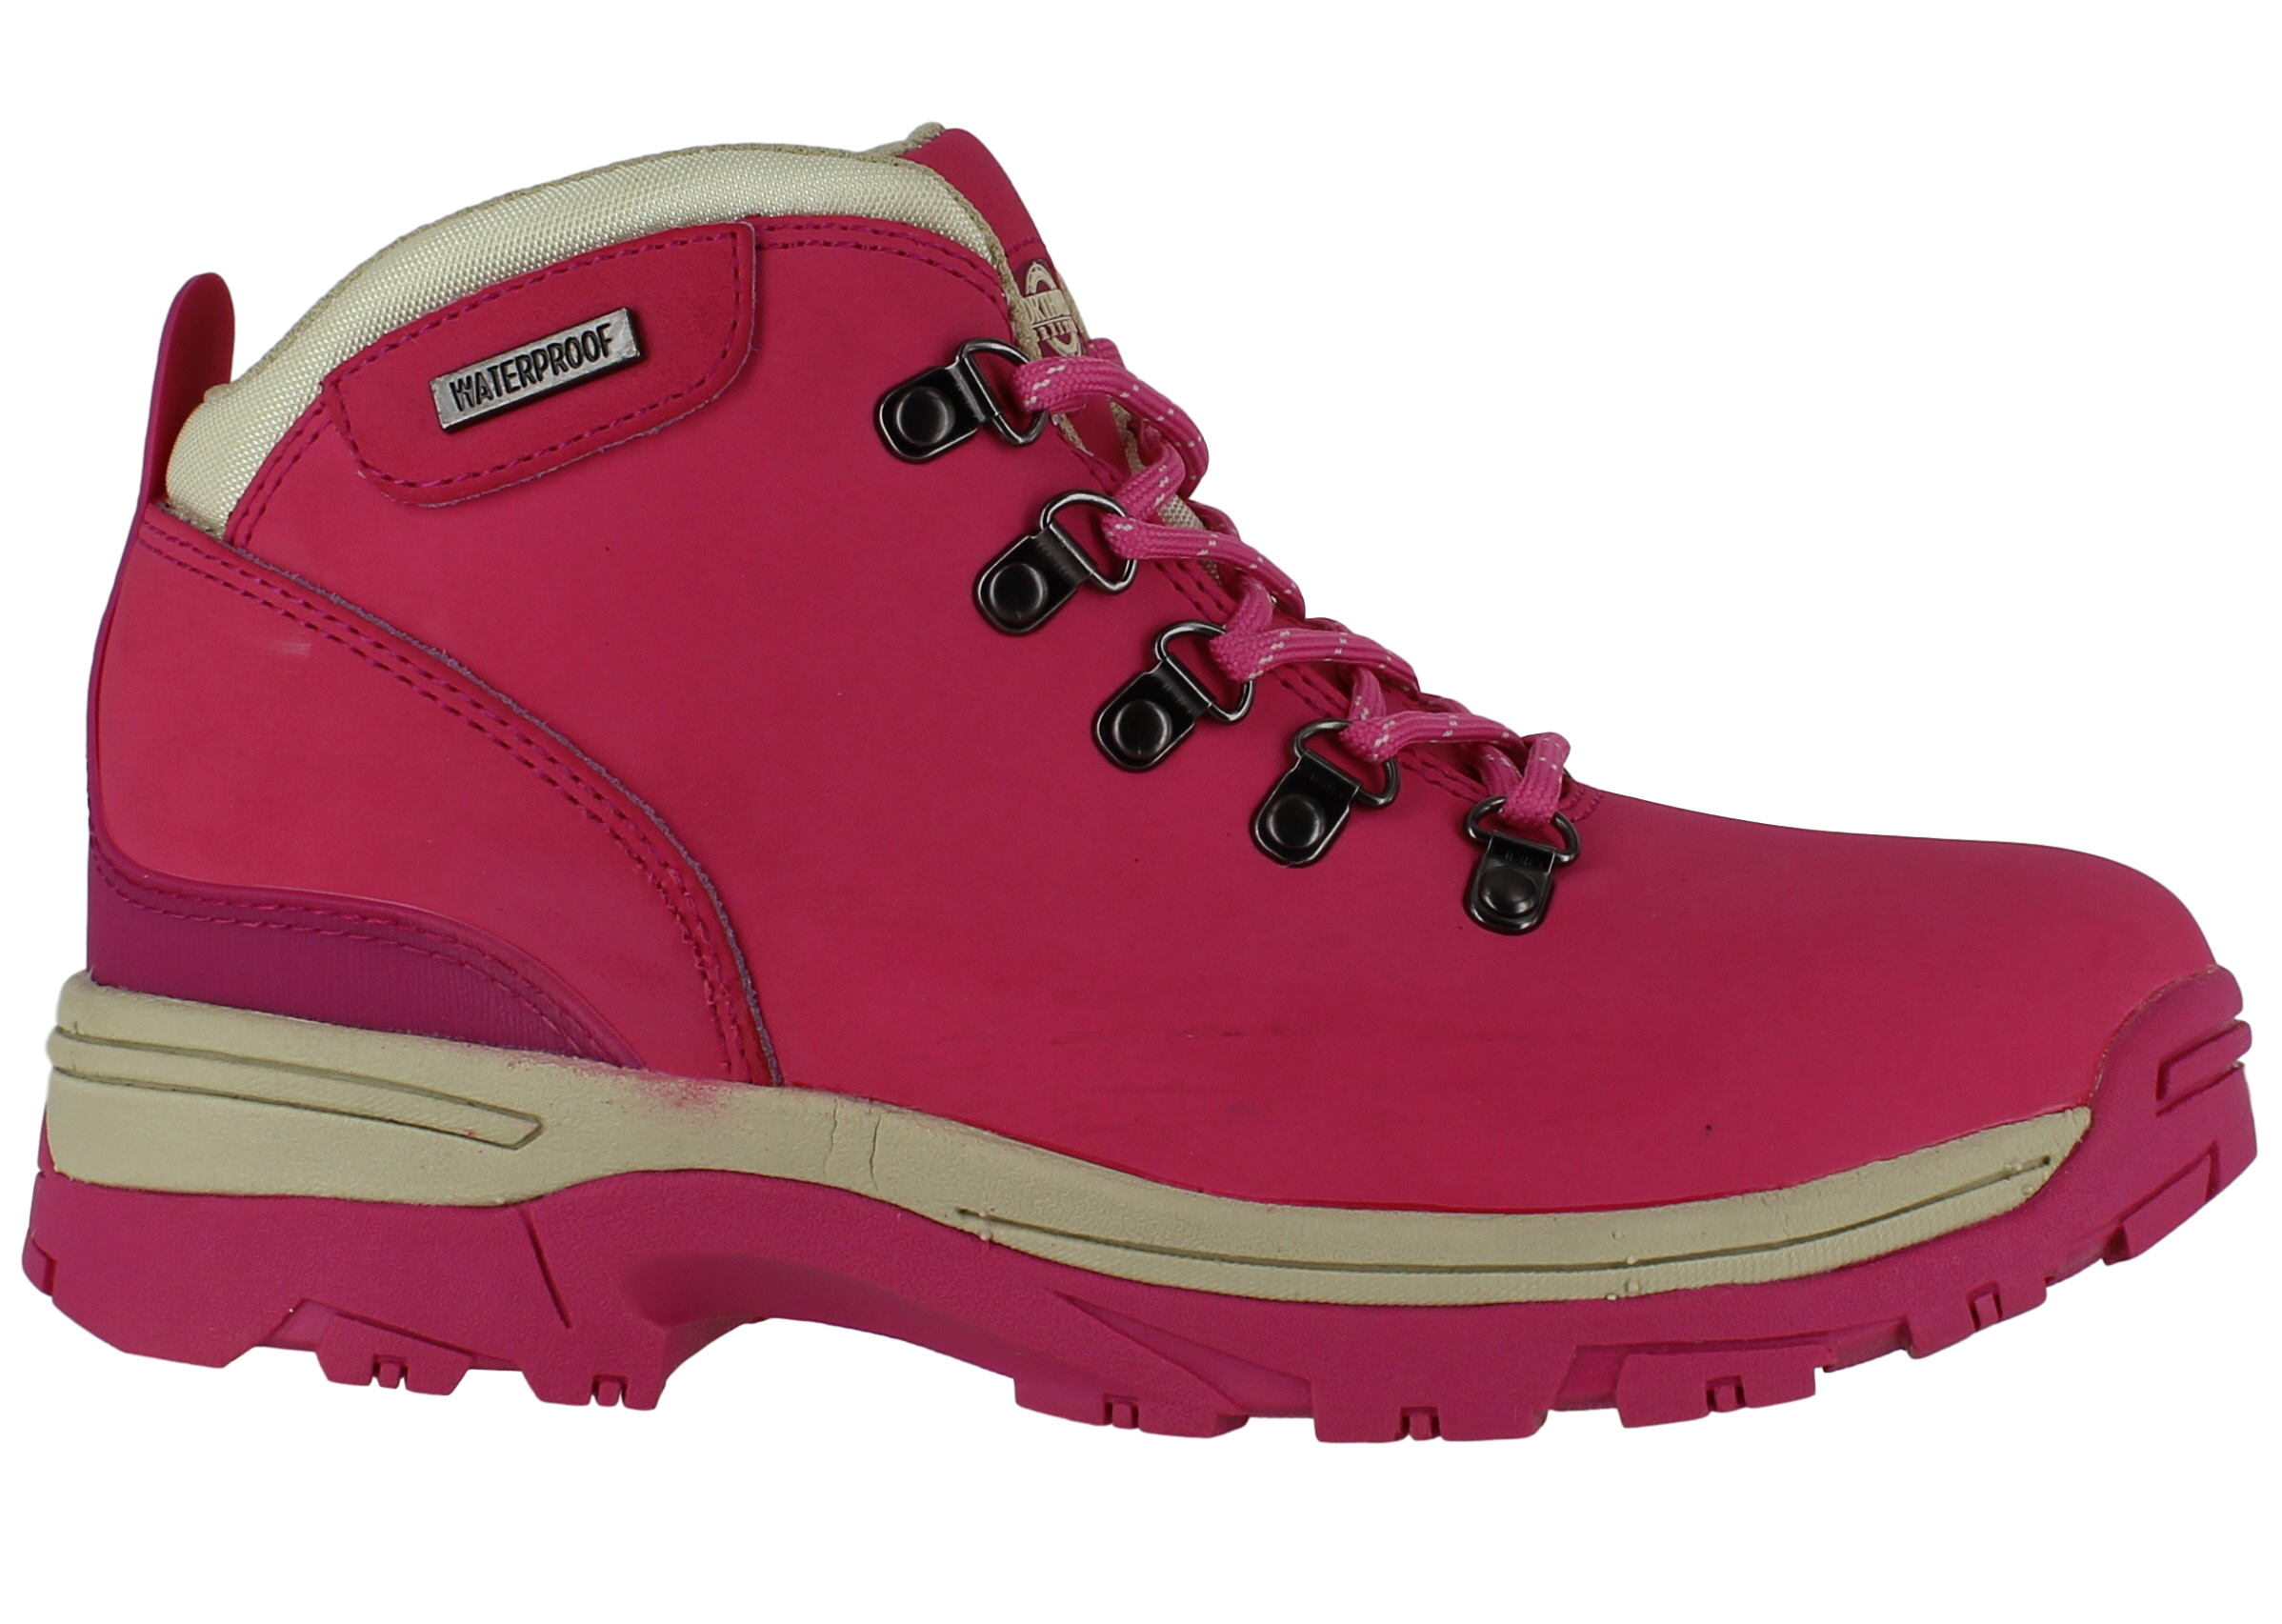 Womens NorthWest WaterProof Leather Lace Up Walking Hiking Boots UK Sizes 3 to 8